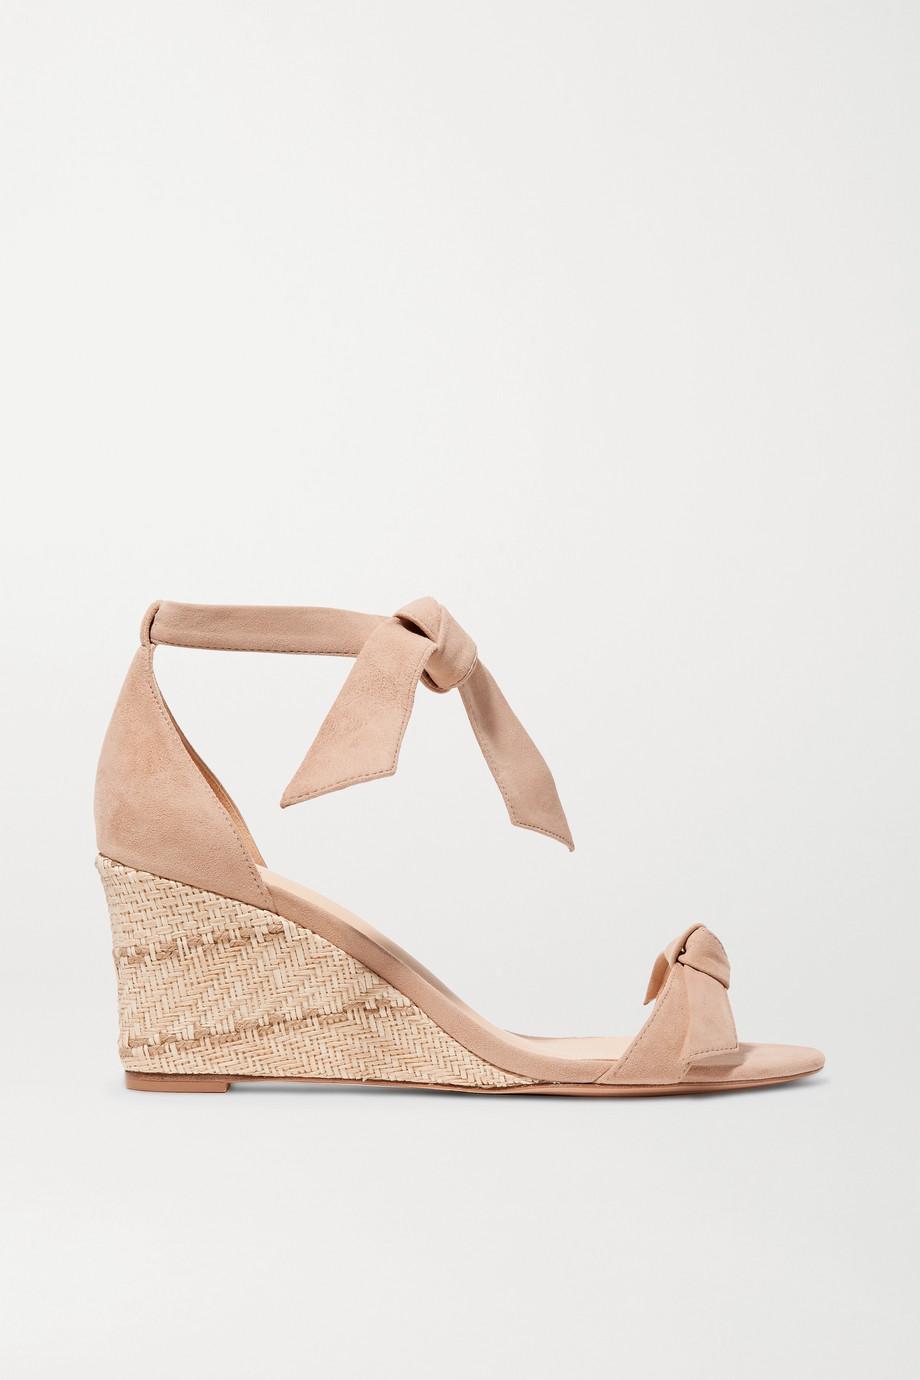 Alexandre Birman Clarita bow-embellished suede espadrille wedge sandals